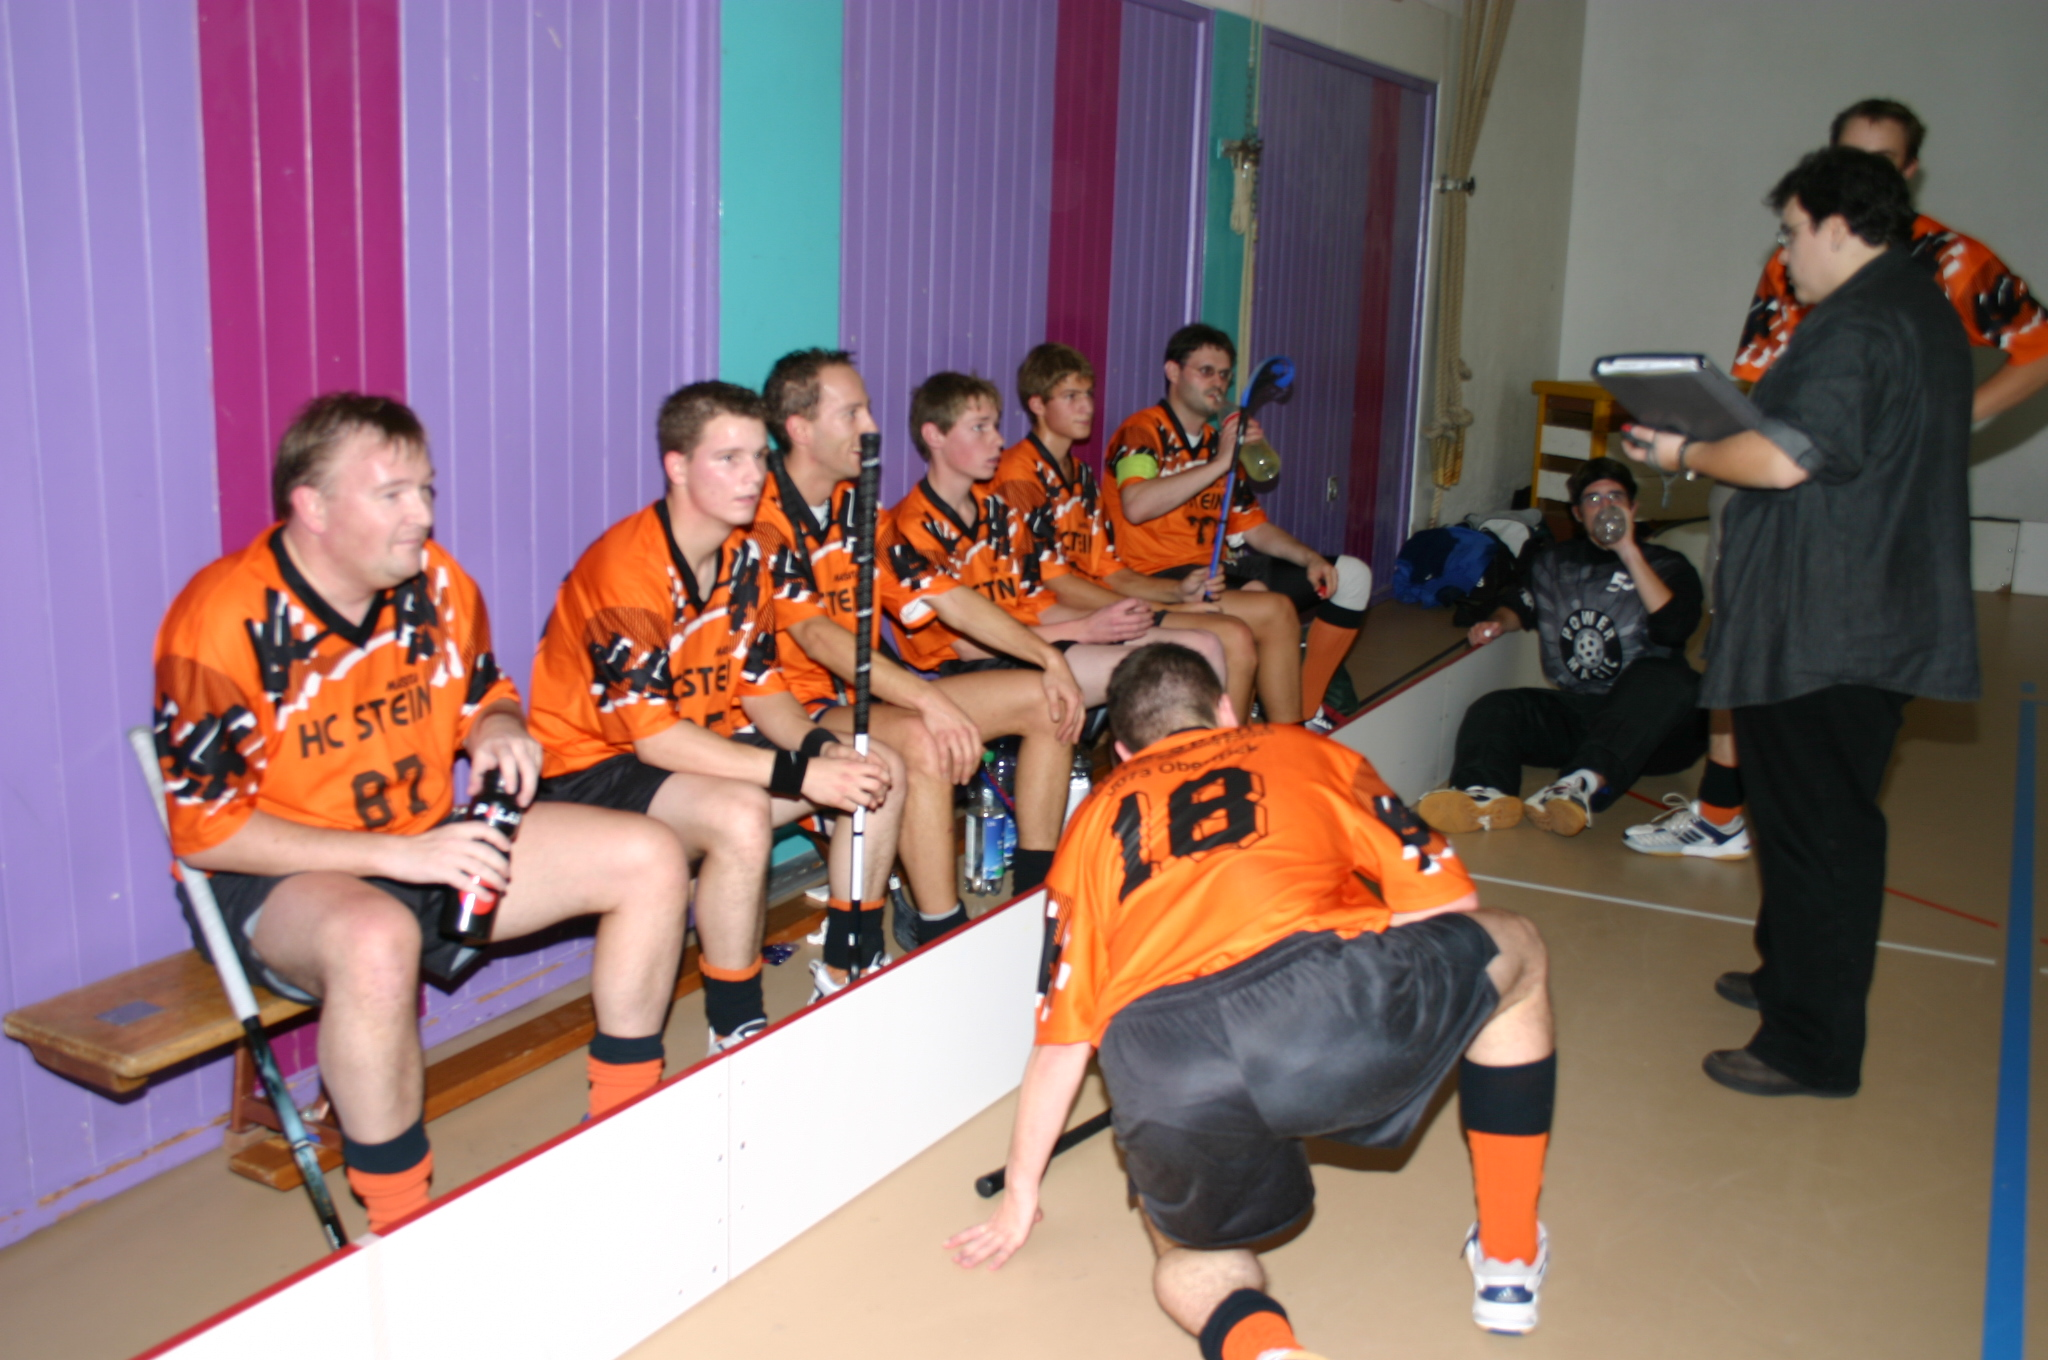 Herren 2 KF (Saison 2003/2004)